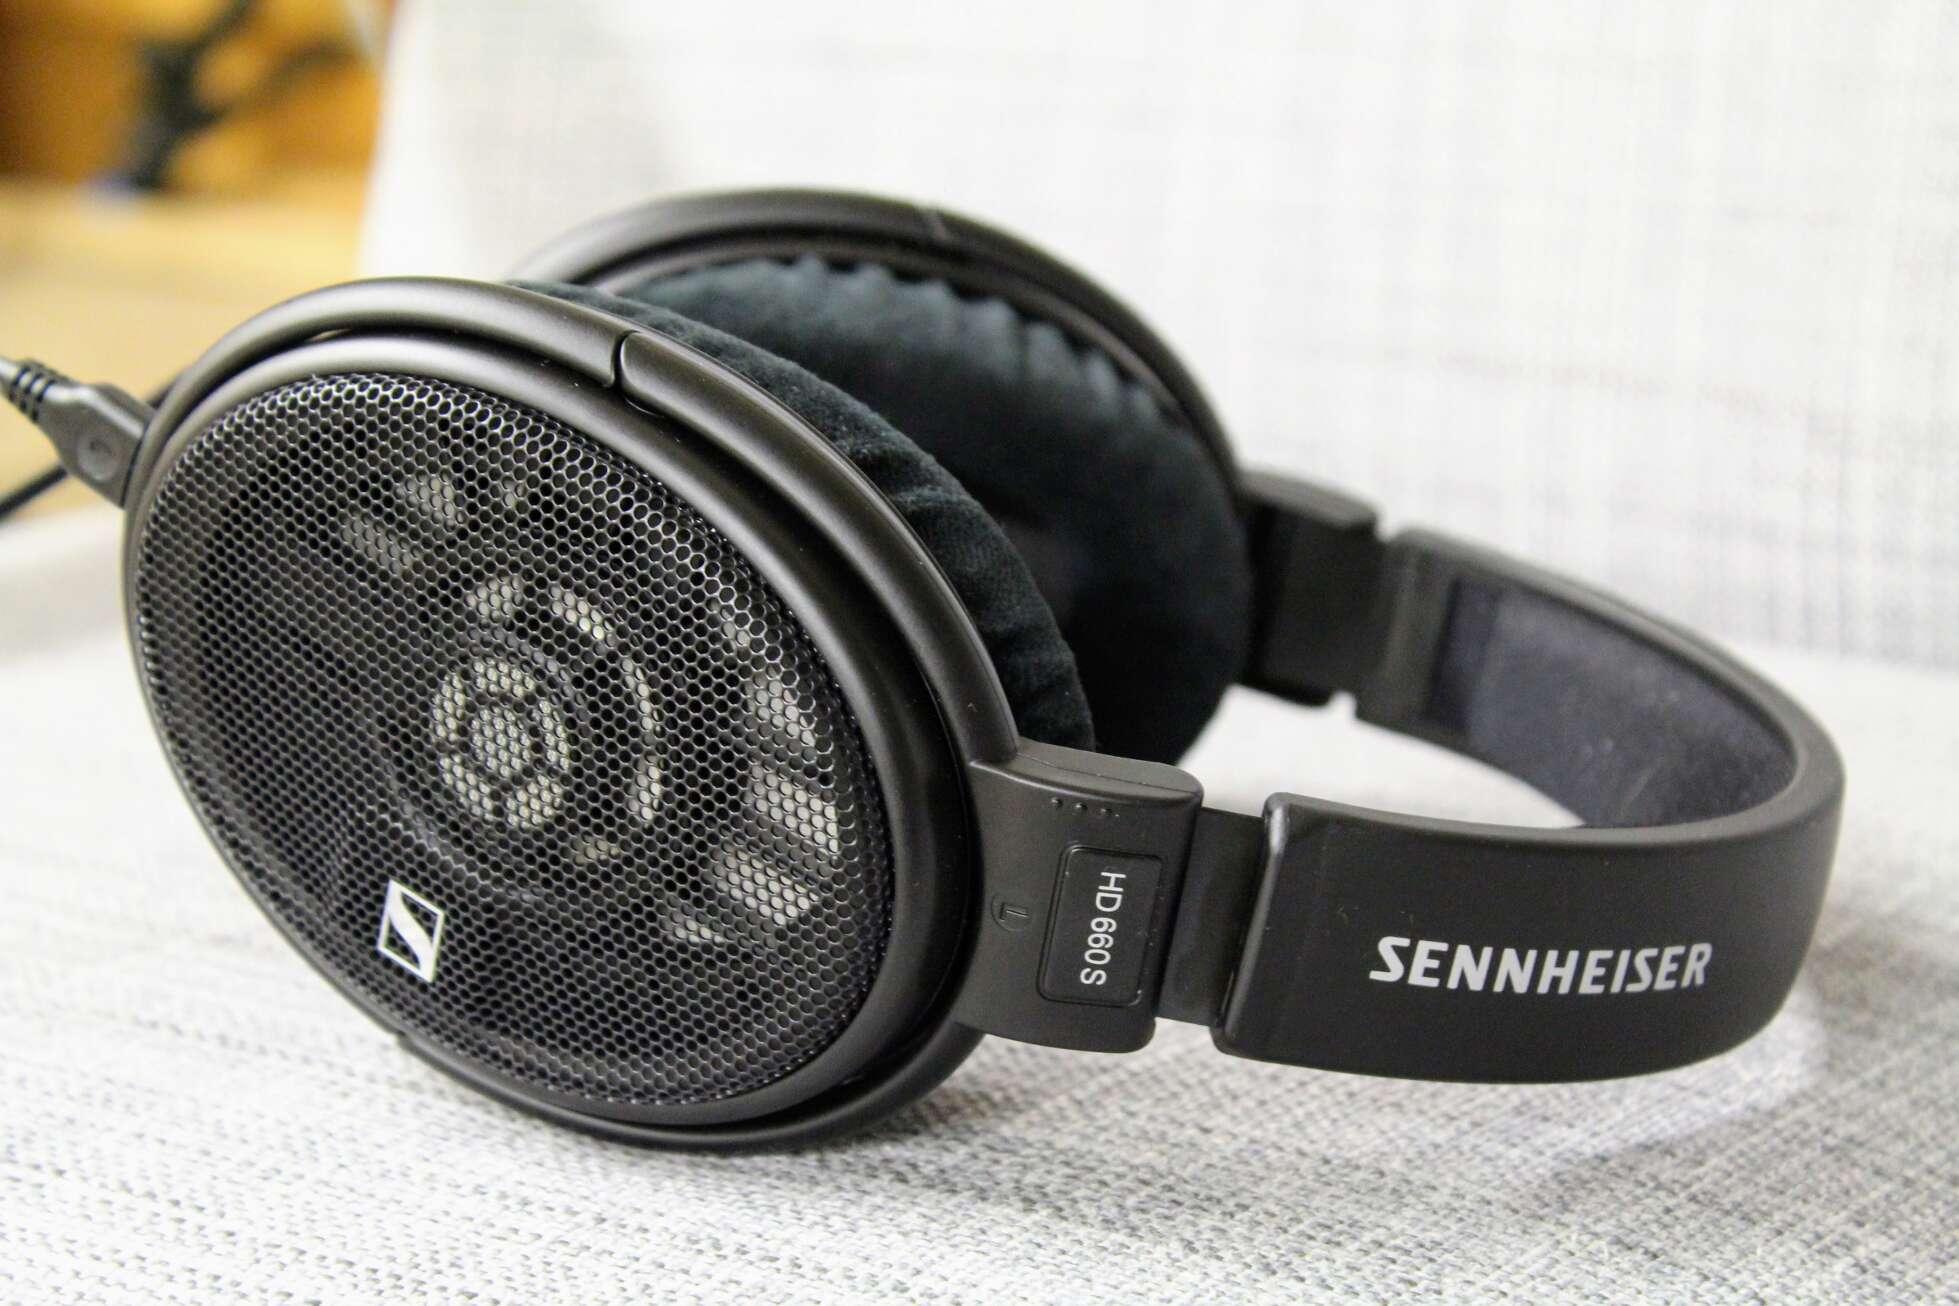 Sennheiser HD660S Modèle présentation